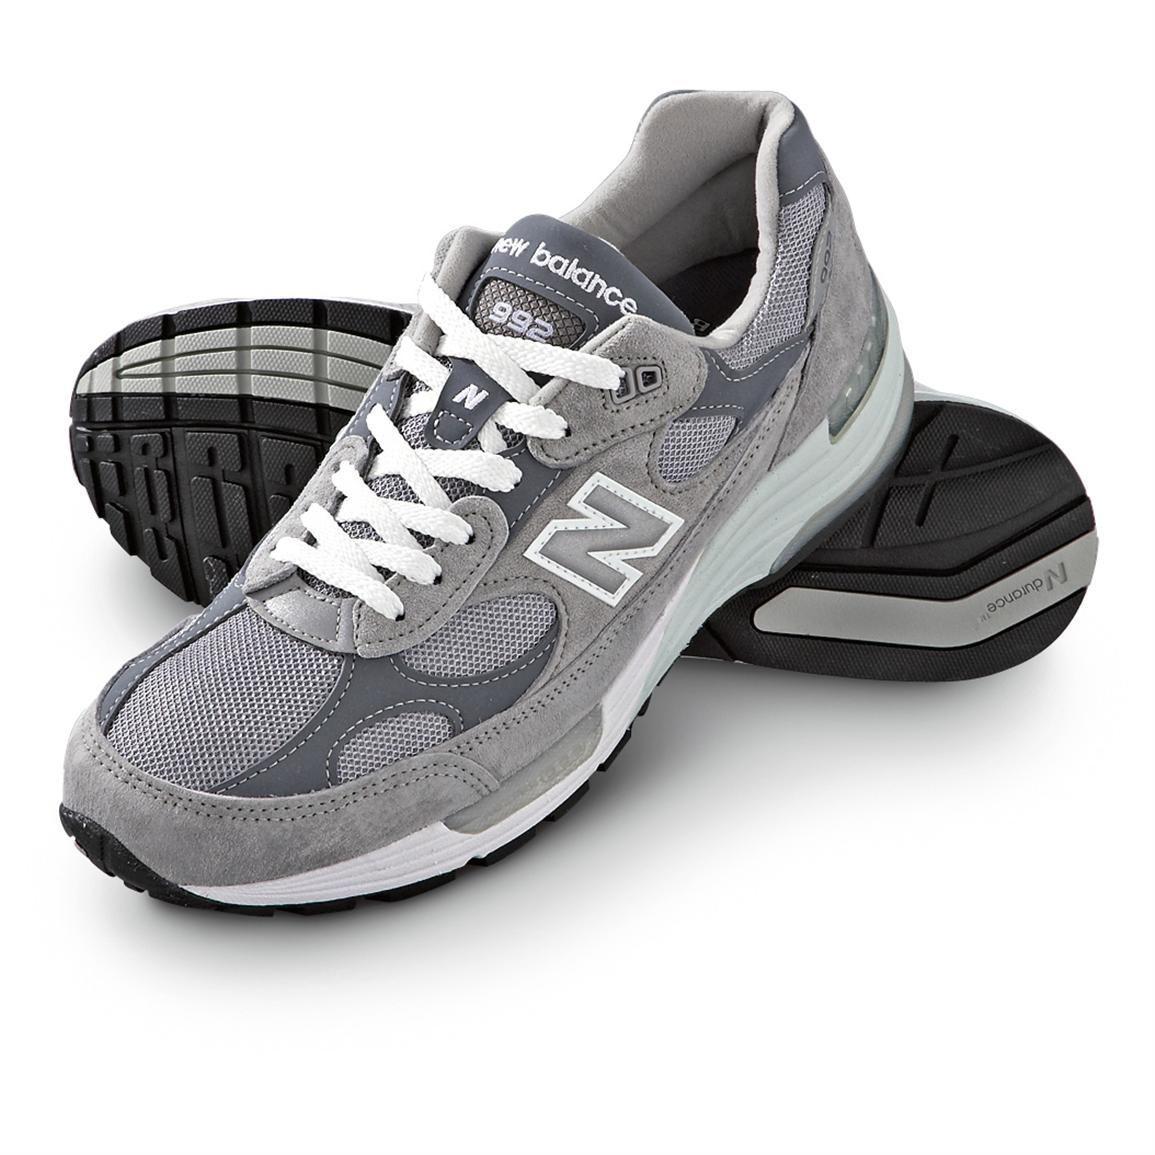 Классические кроссовки New Balance 992 - фото-обзор модели серии M 992 GL 458196543d6ca